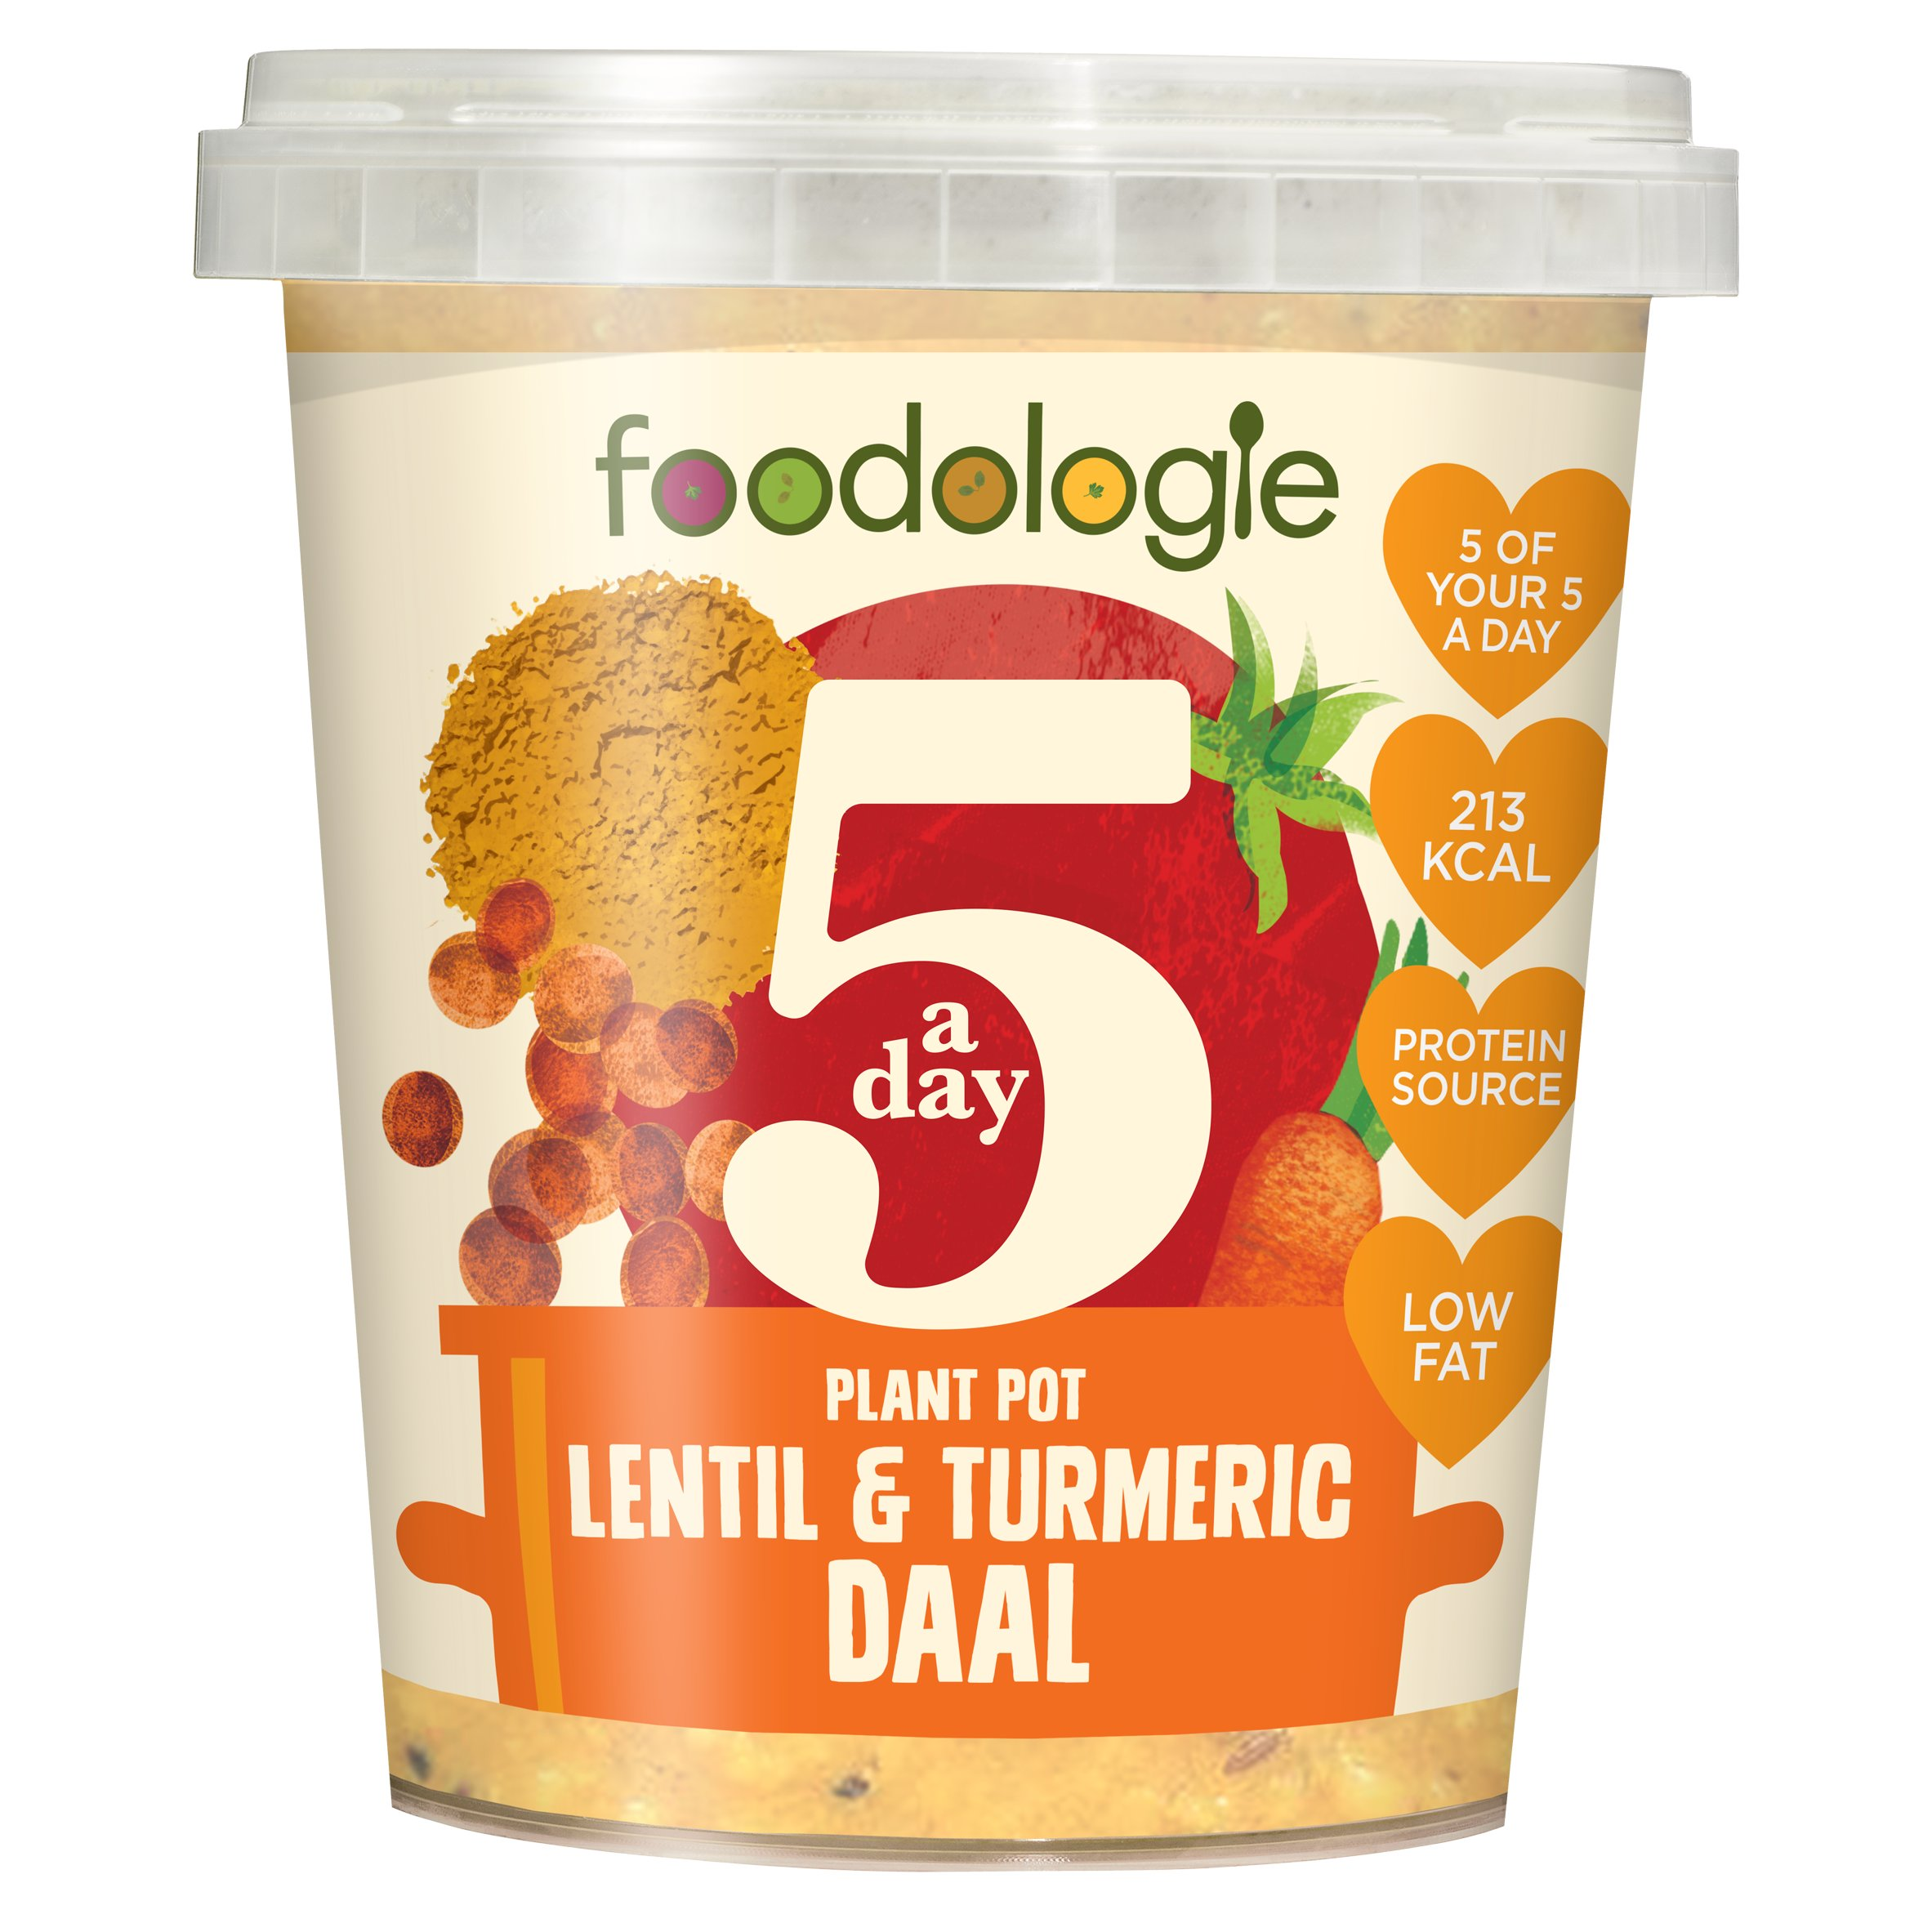 Foodologie 5 A Day Turmeric & Lentil Daal 400G